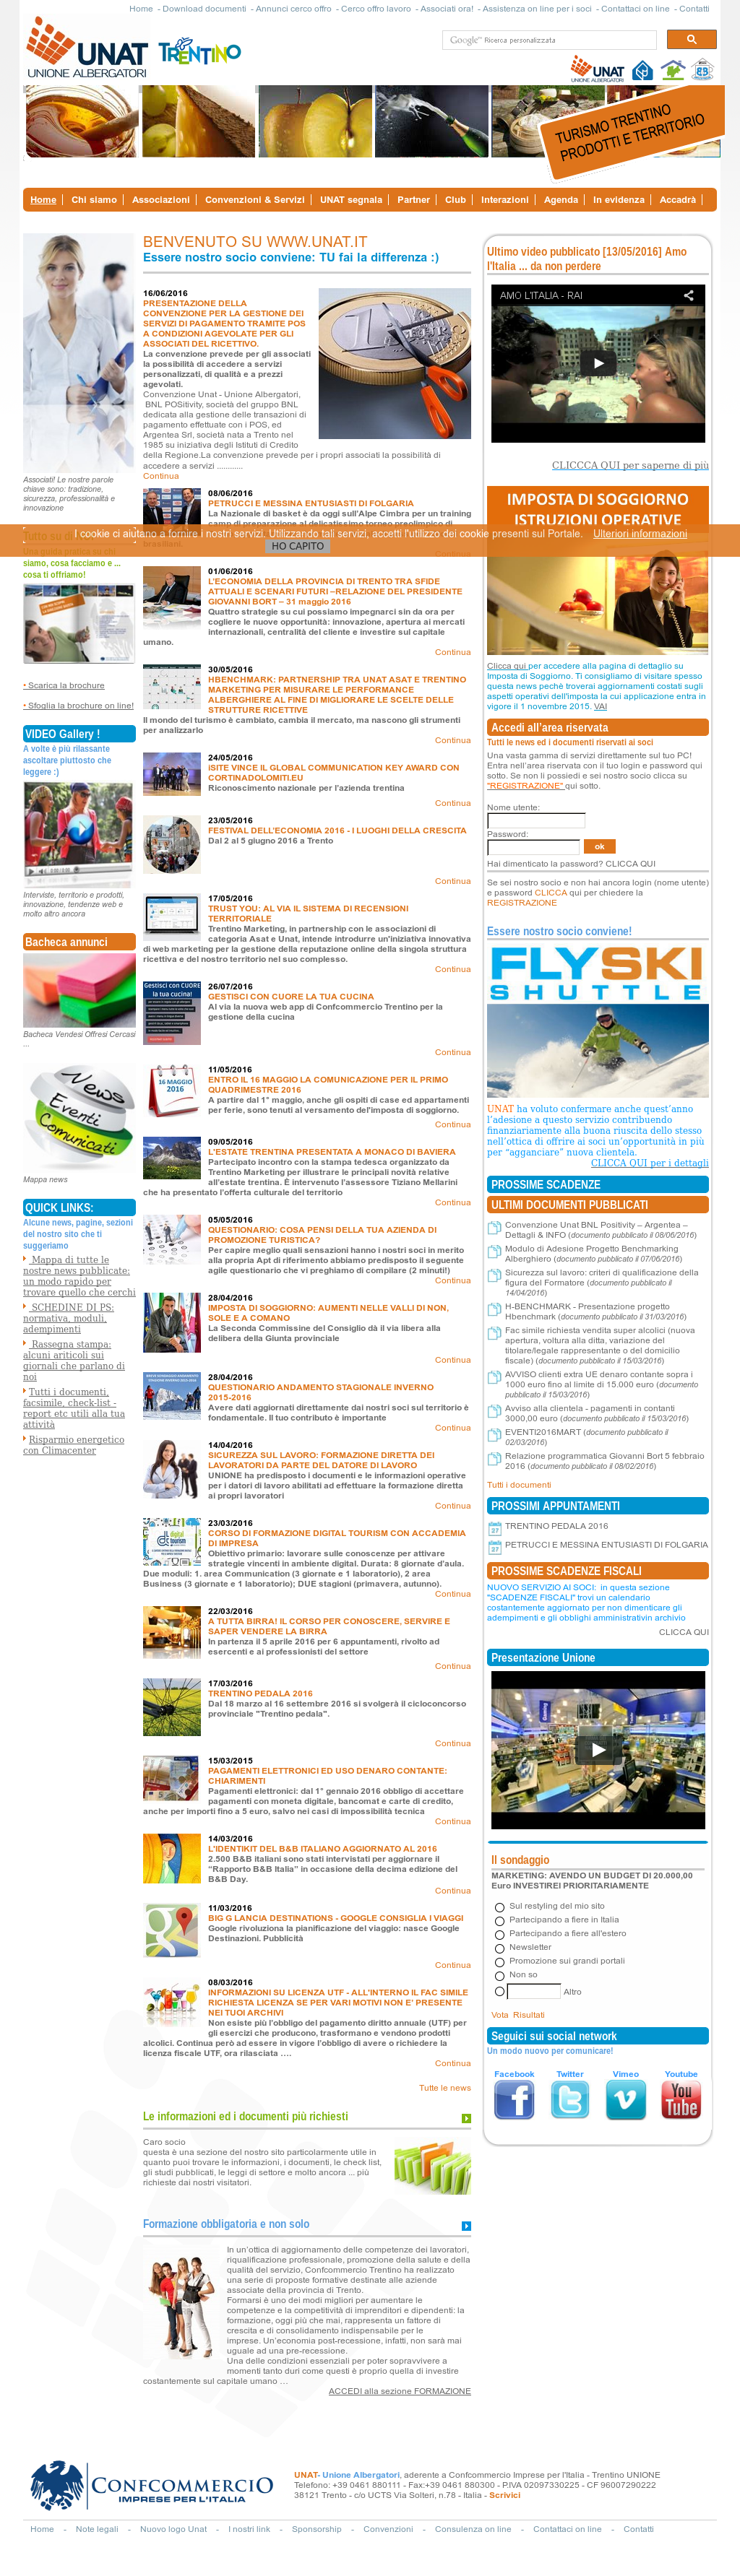 Unat Competitors, Revenue and Employees - Owler Company Profile